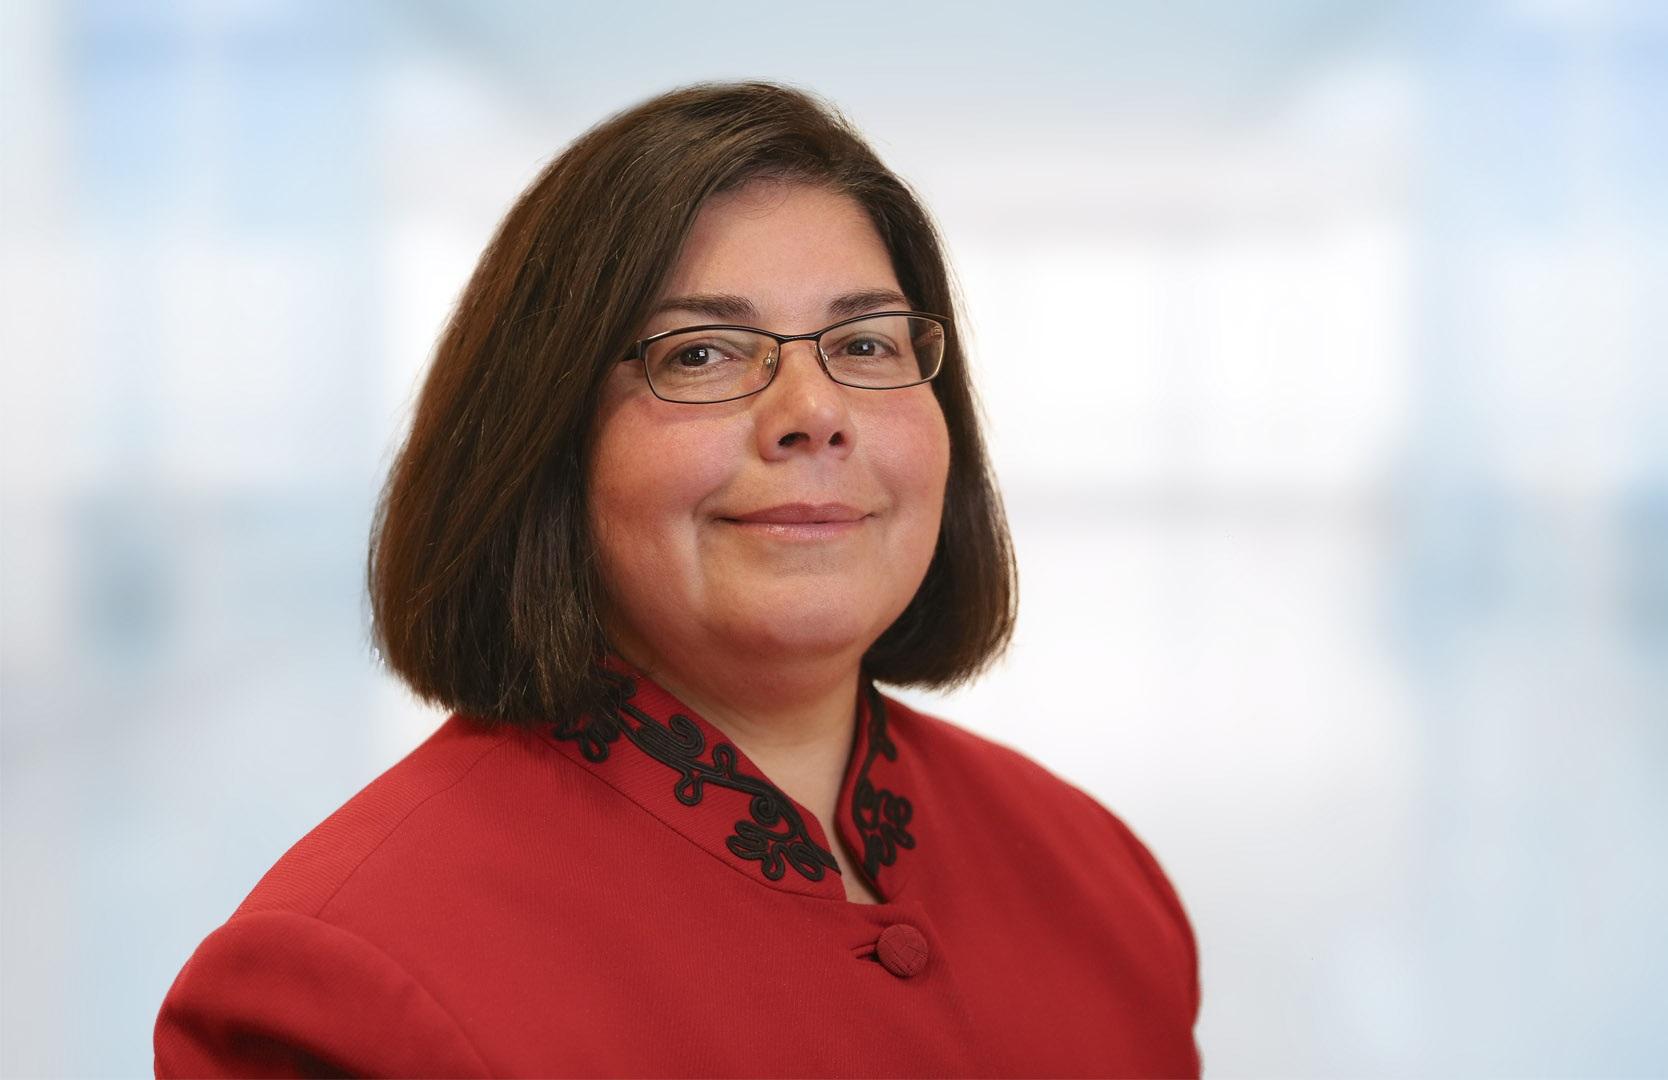 Maria Houchins